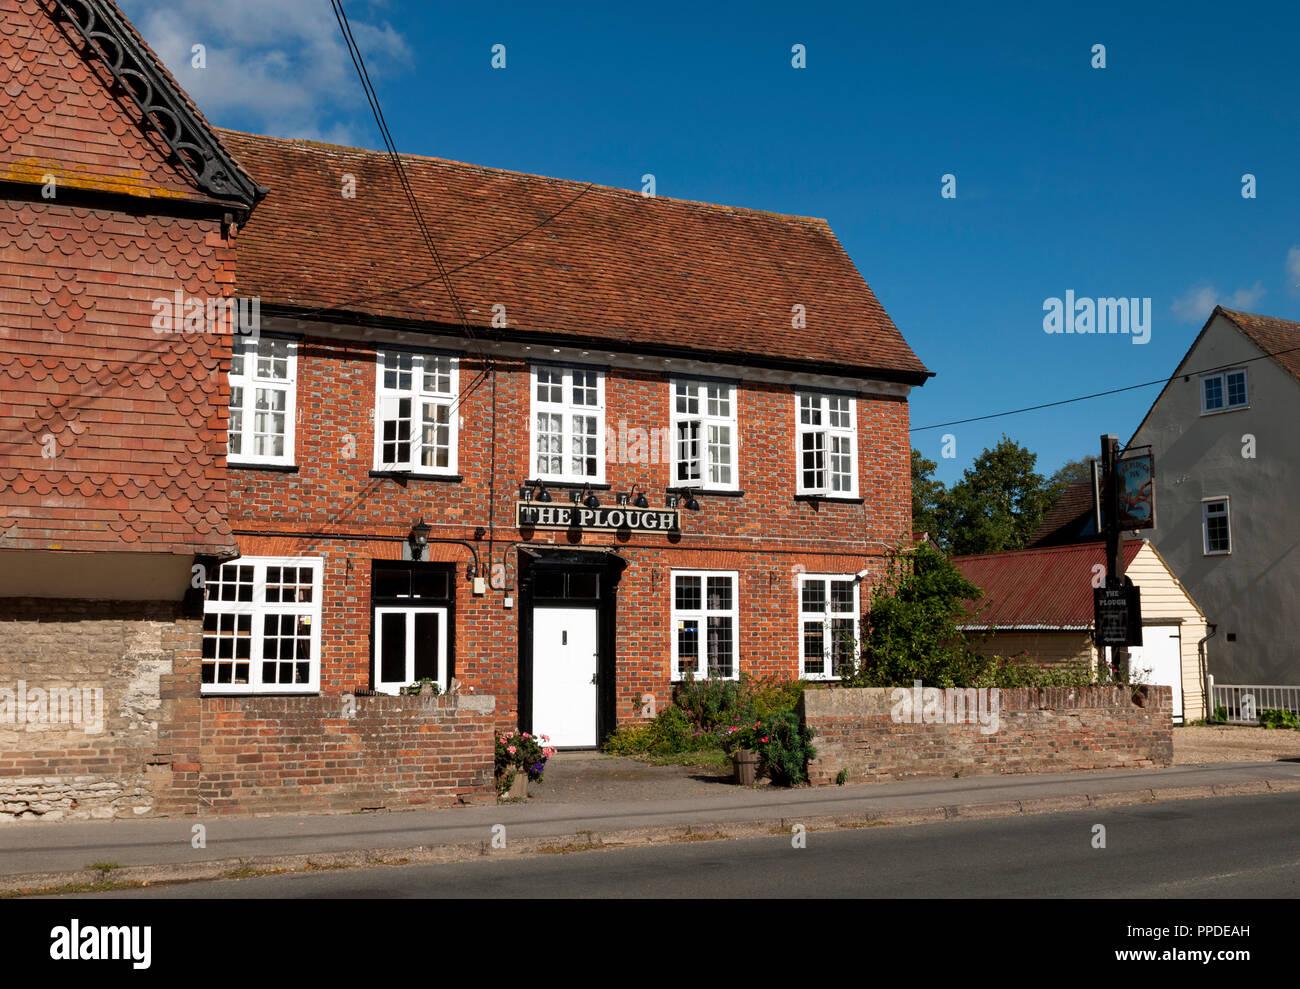 The Plough pub, Long Wittenham, Oxfordshire, England, UK - Stock Image